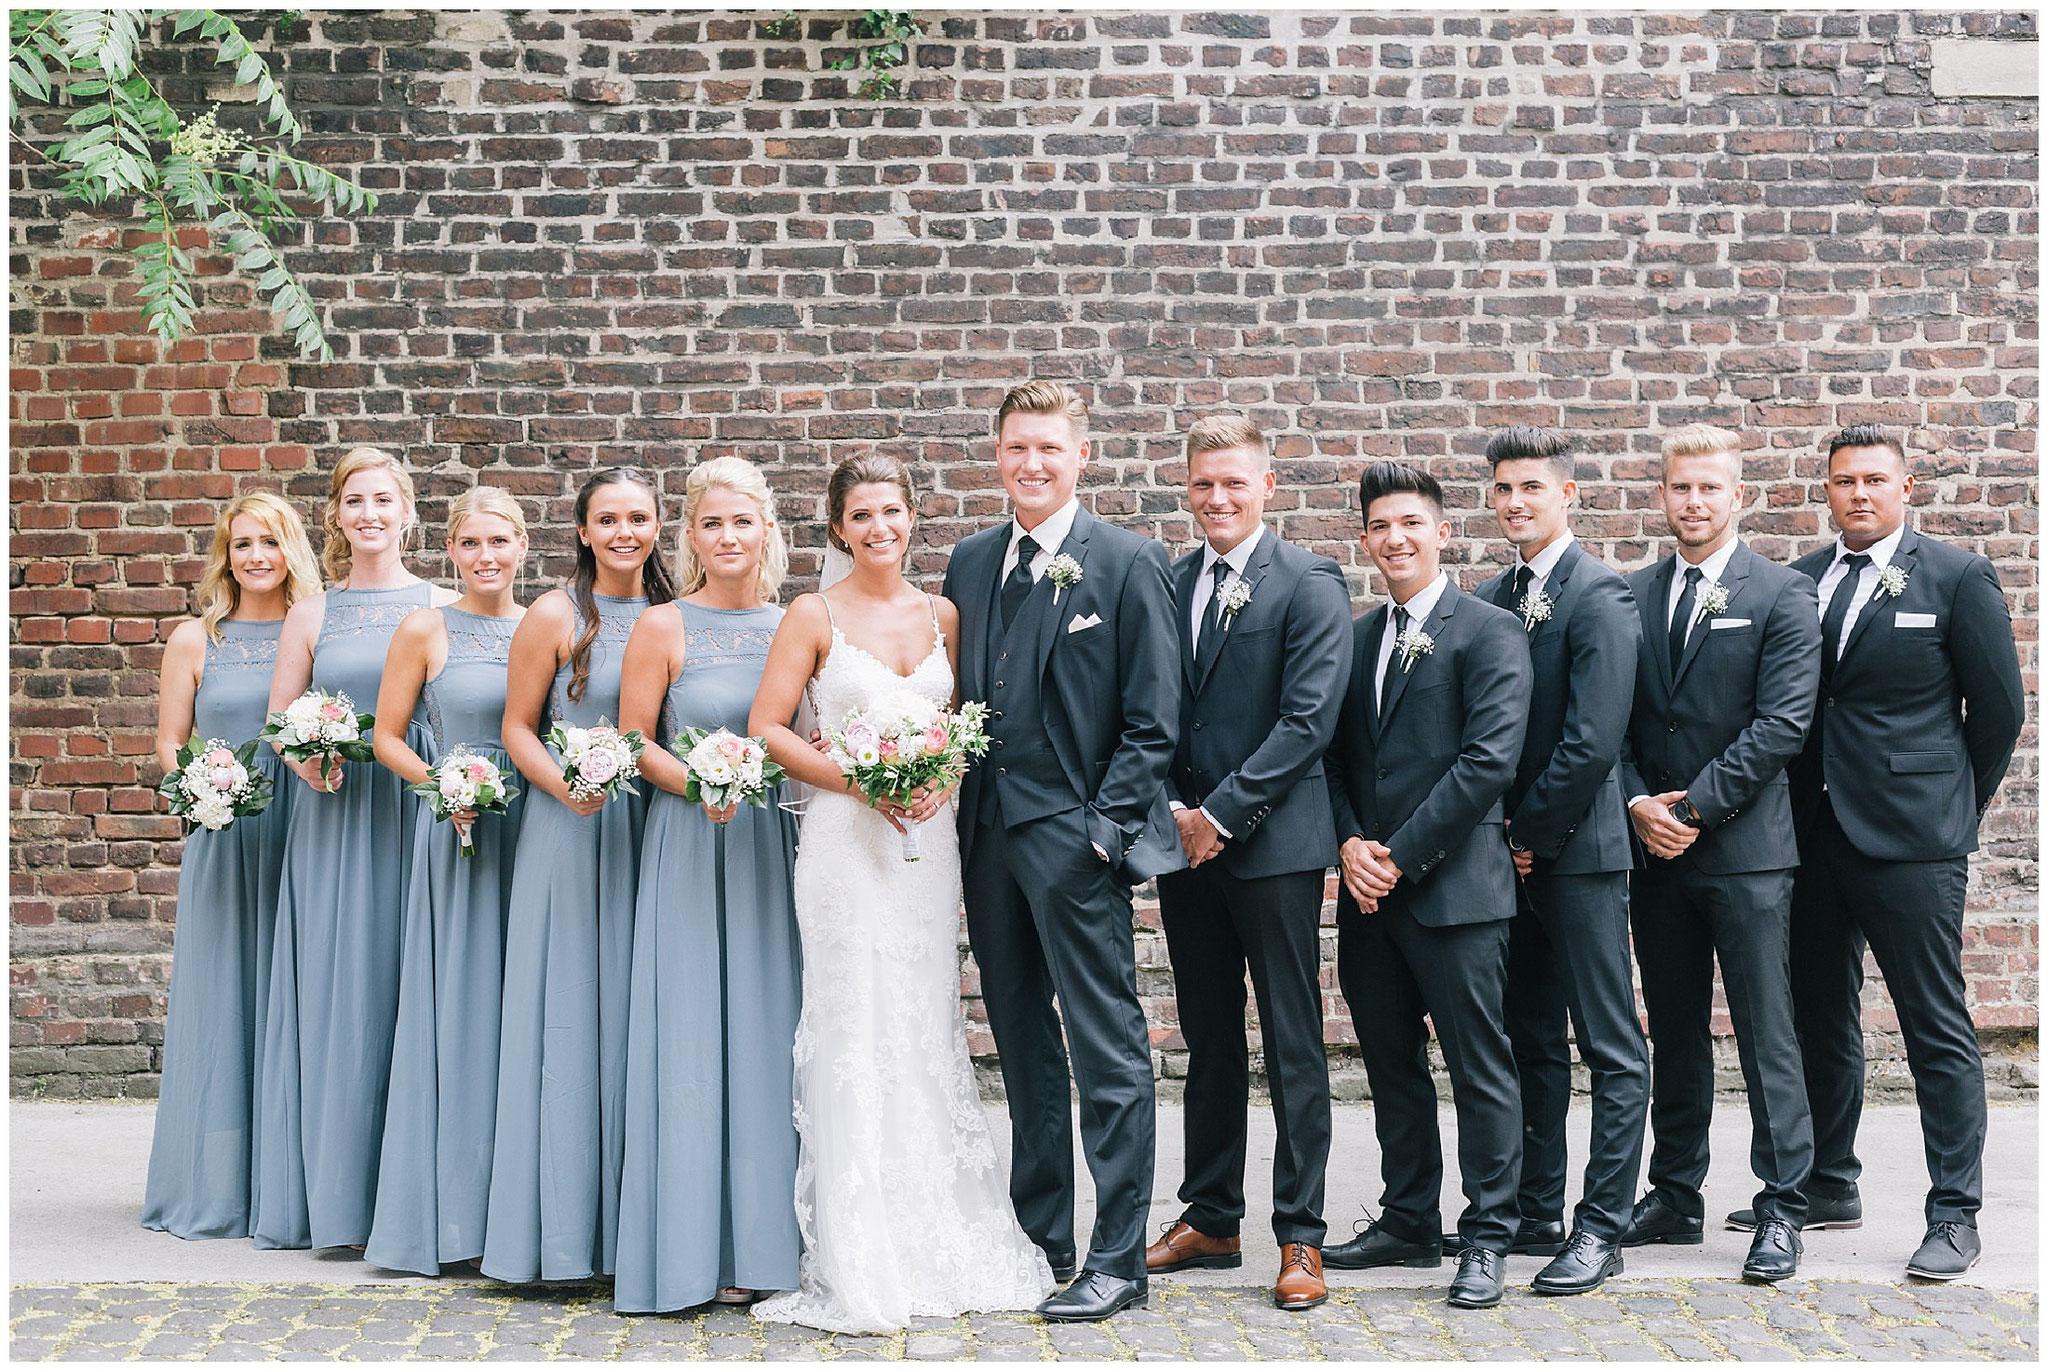 fine art hochzeit Gruppenbild bridalgang weddingparty best men groomsmen brautjungfern bridesmaids